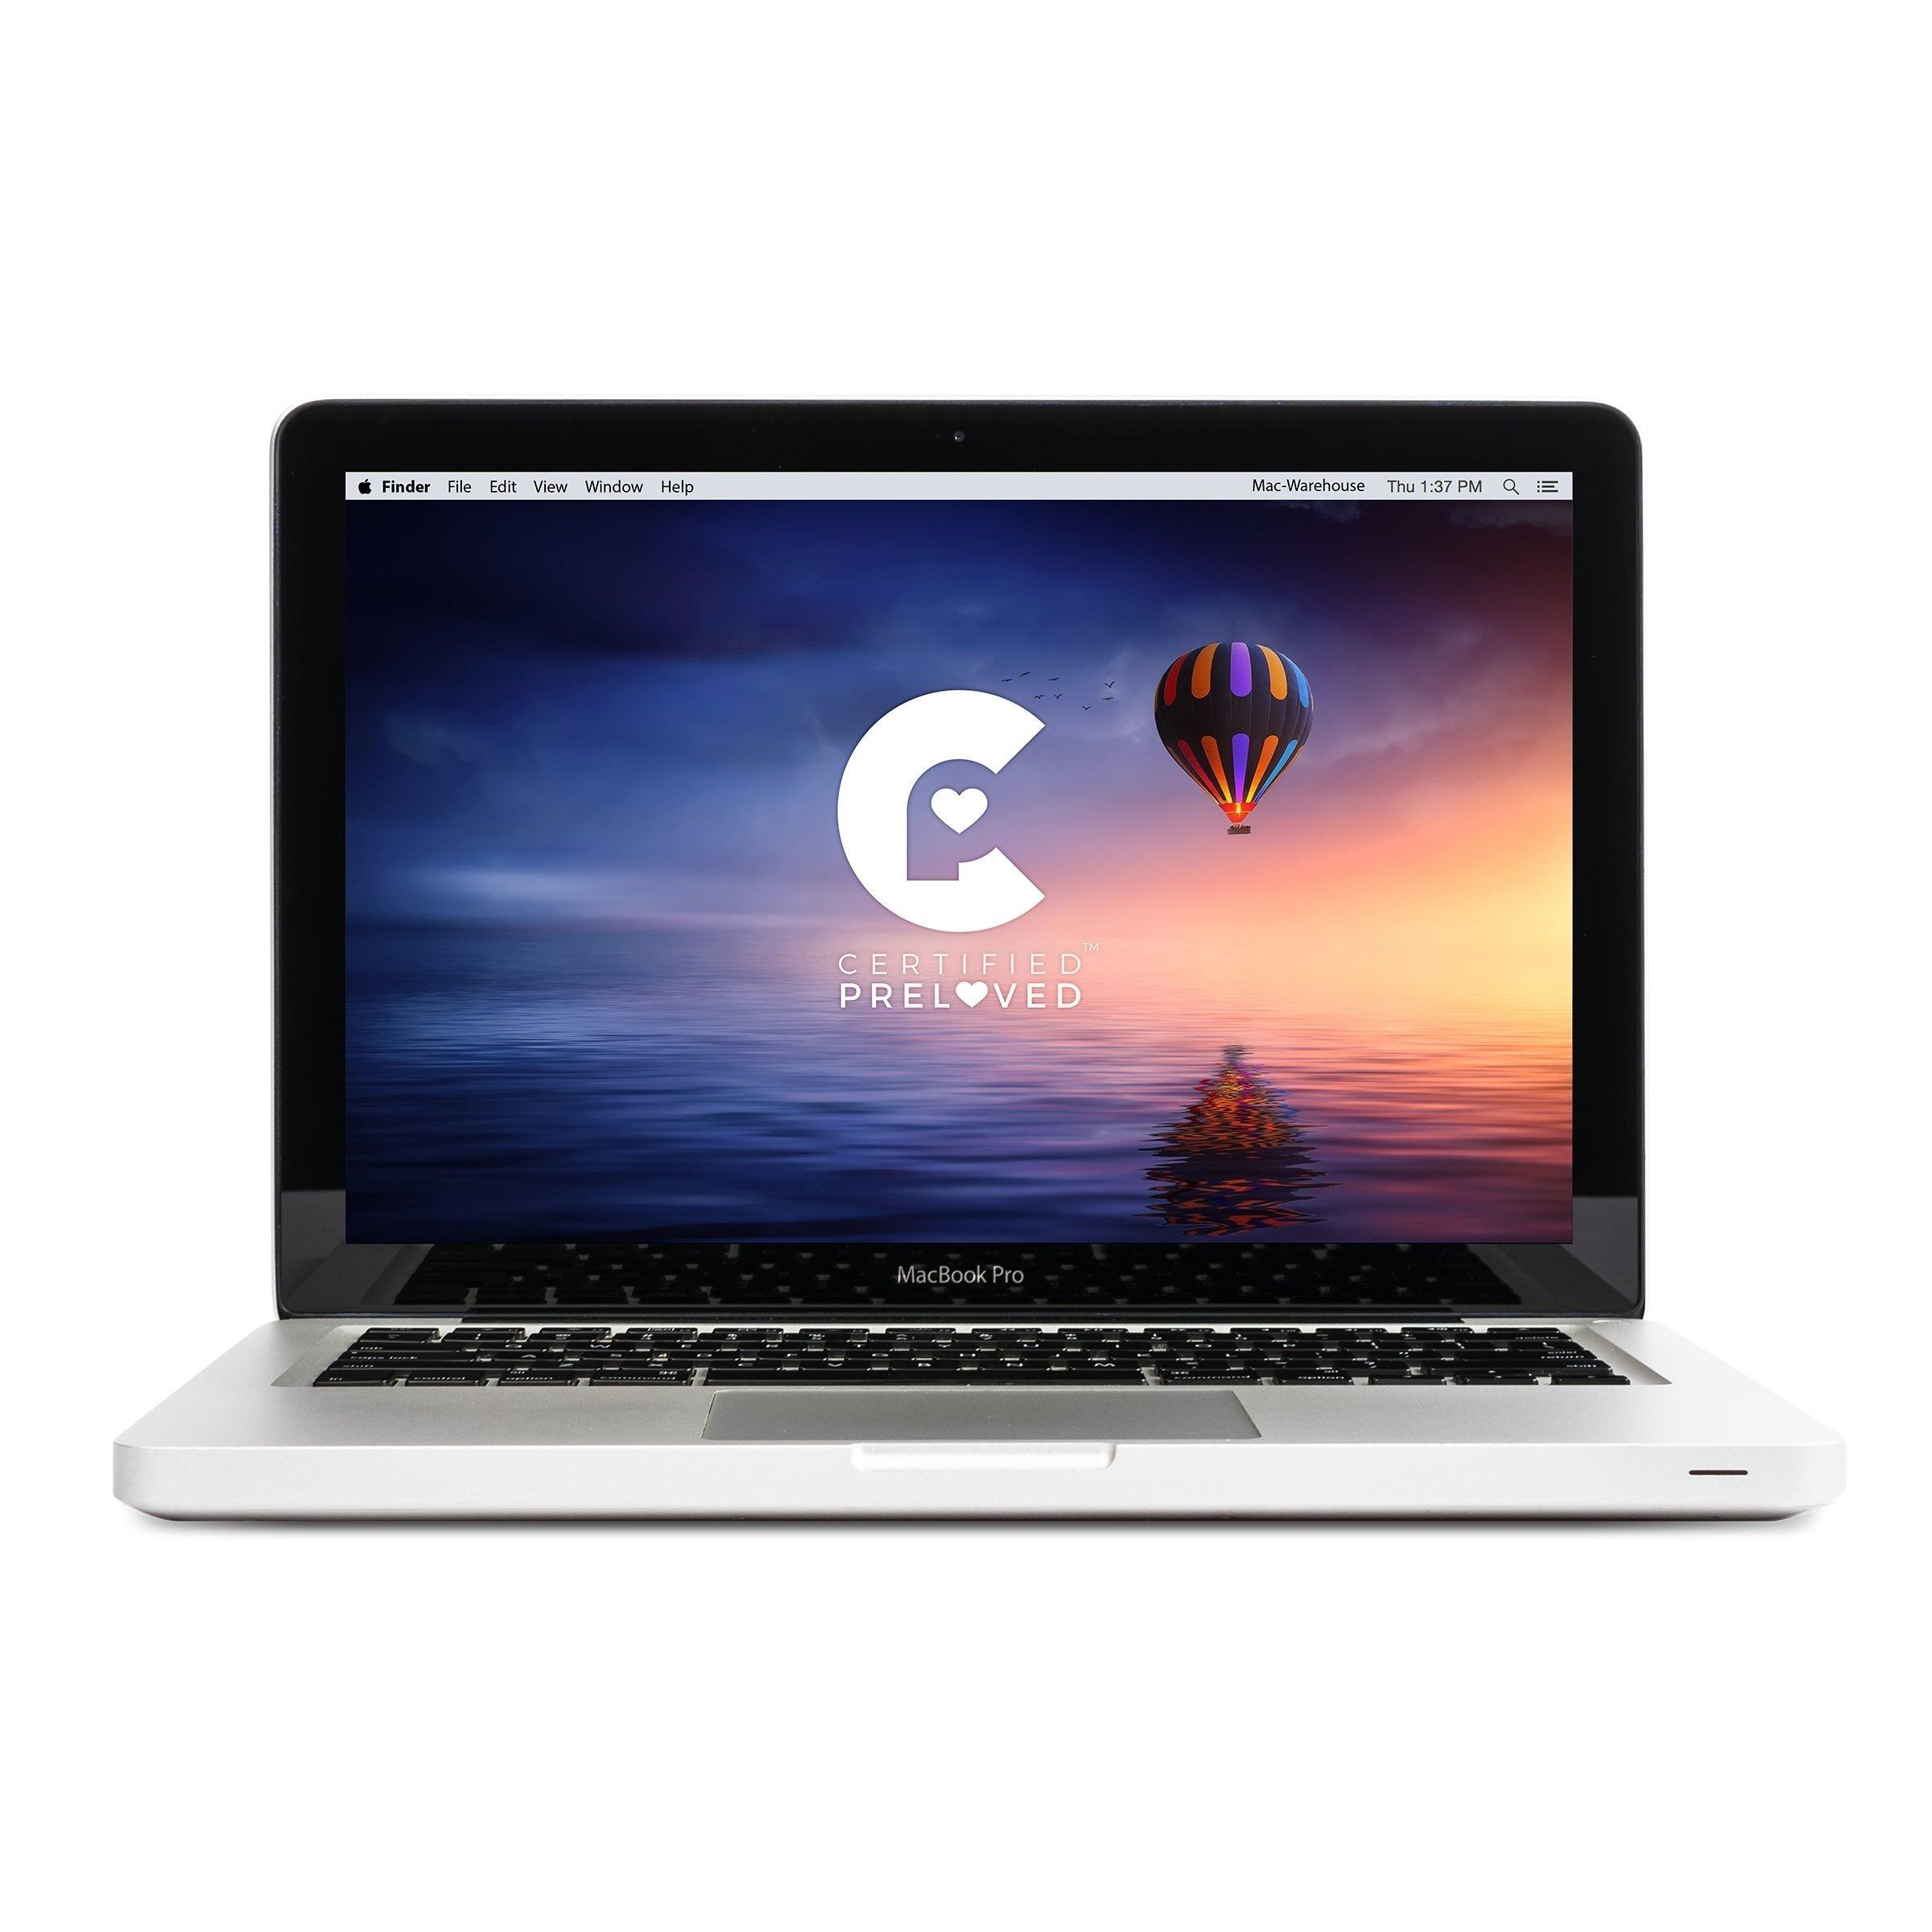 Apple MC700LL/A 13.3-inch Macbook Pro Dual-Core i5 2.3 GHz – Certified Preloved